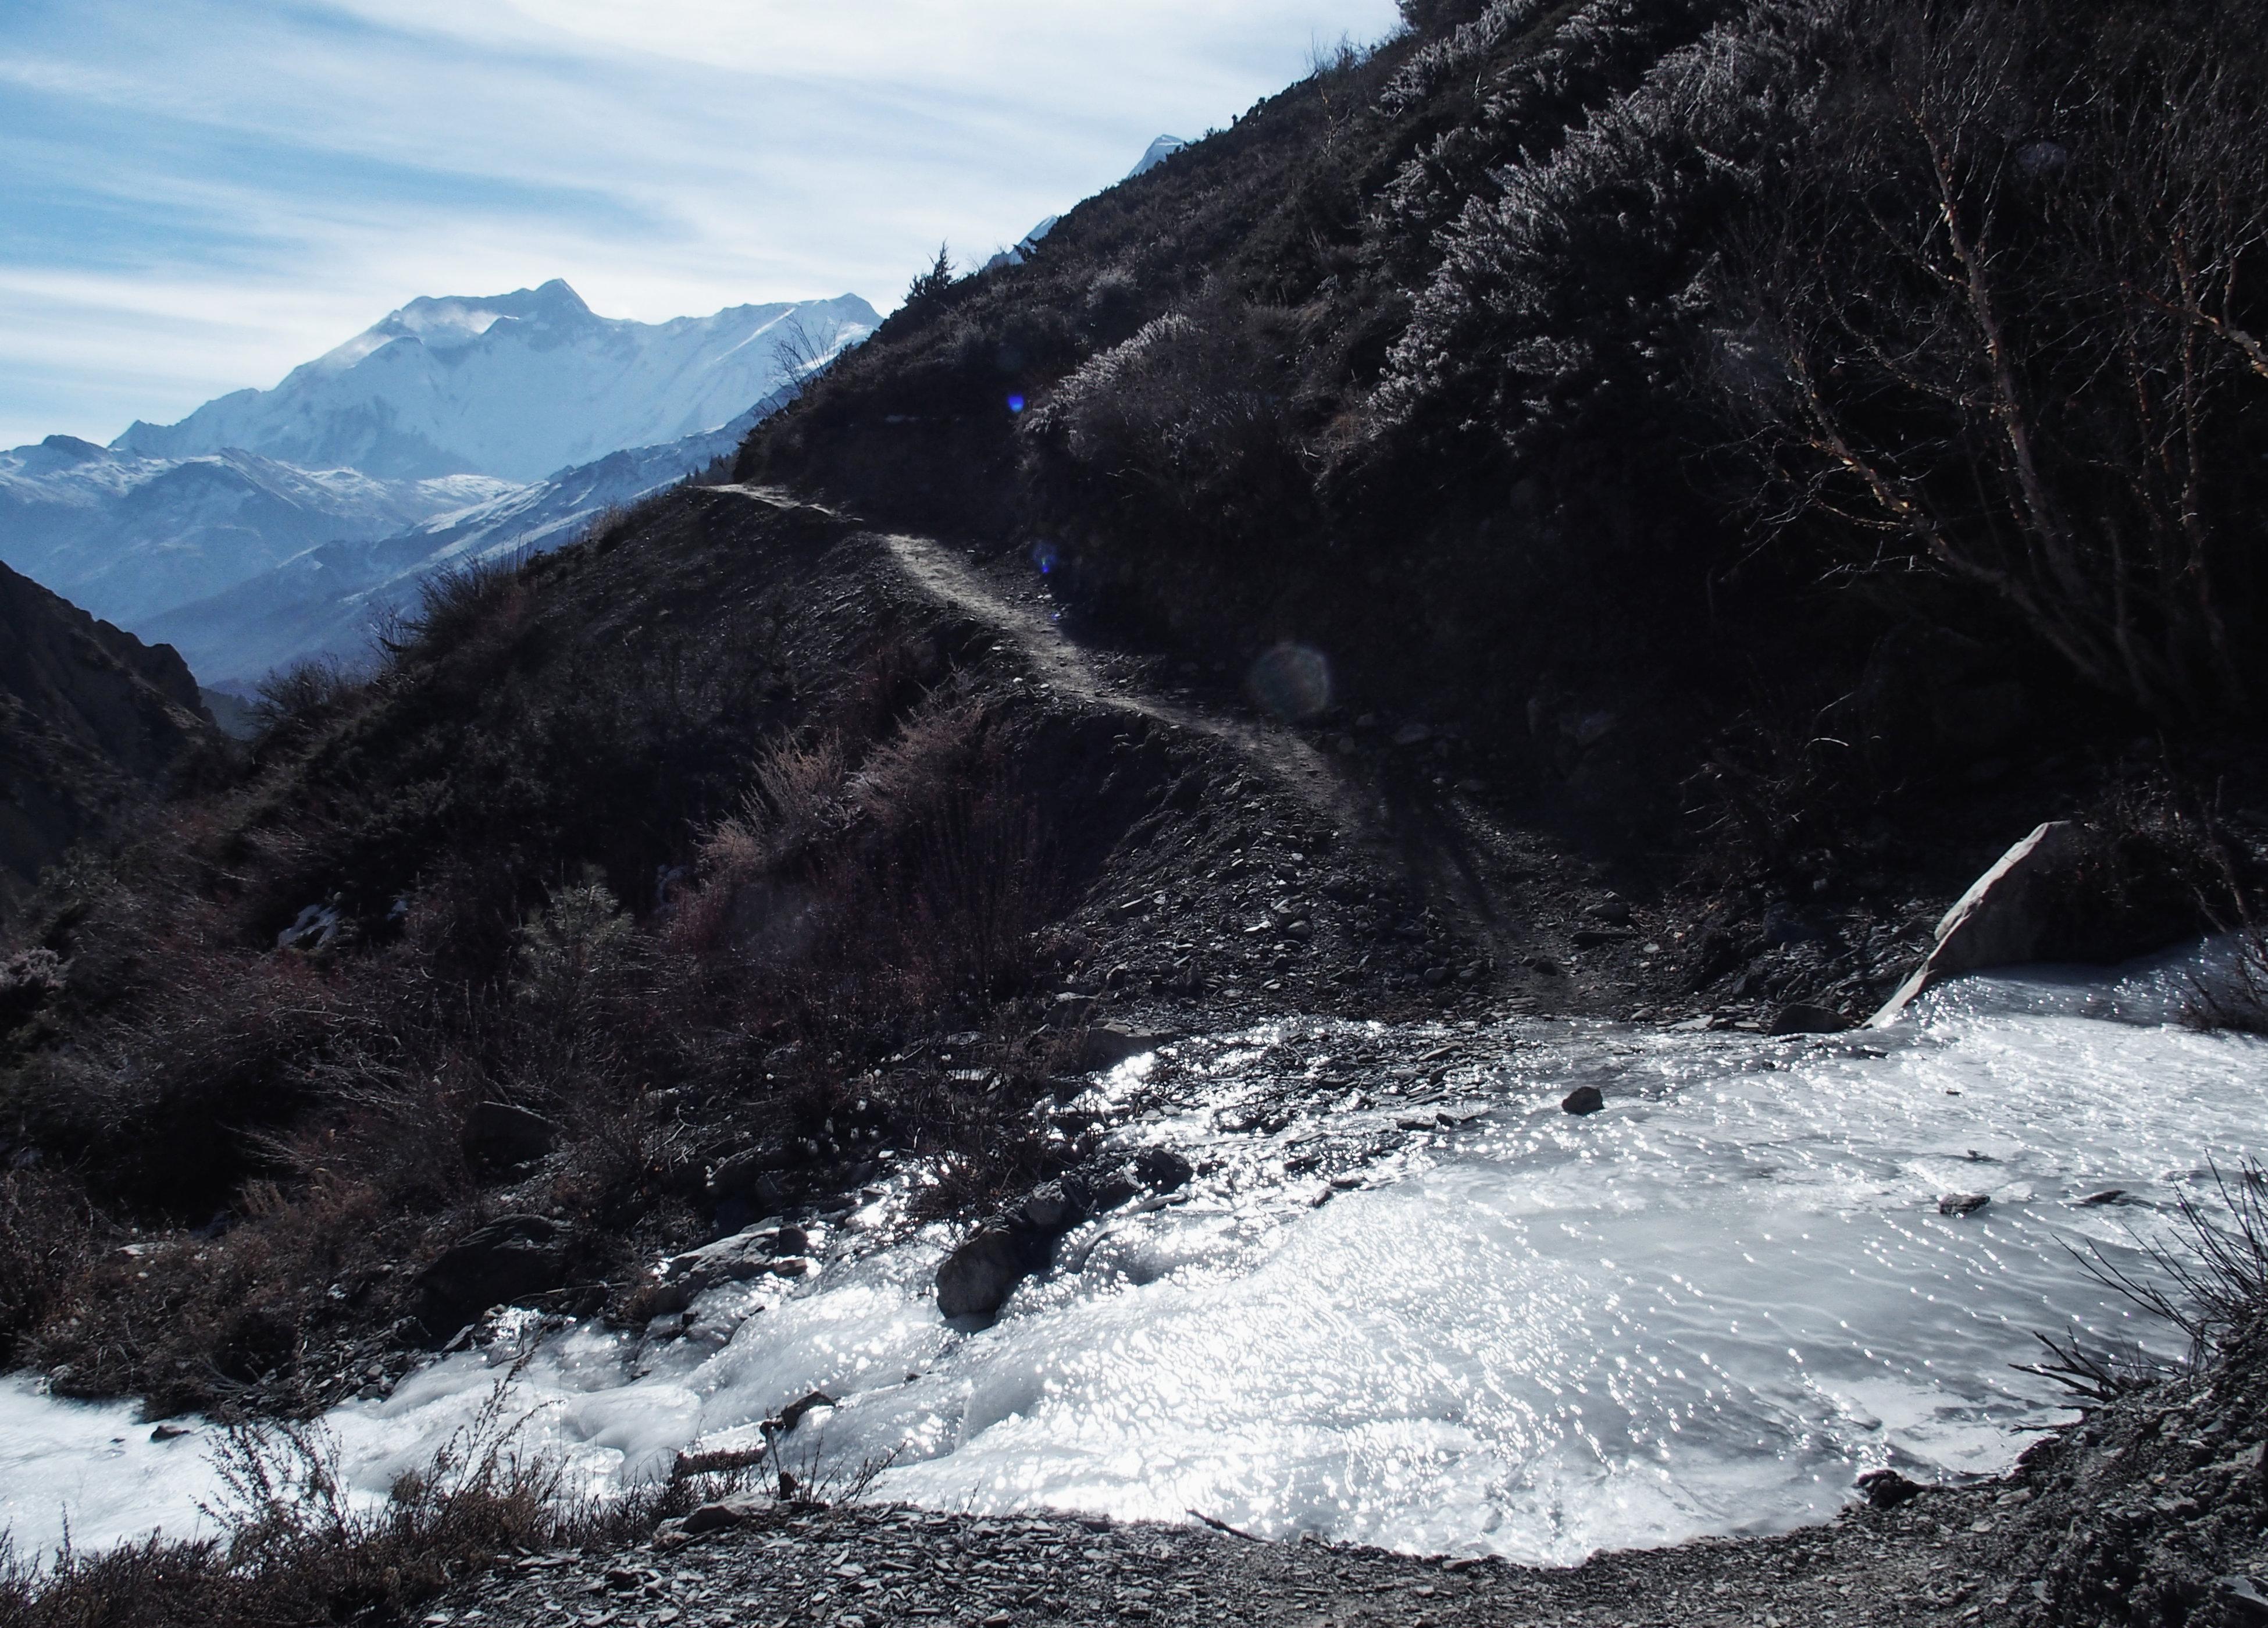 Eis auf dem Trail - Annapurna Circuit Trekking